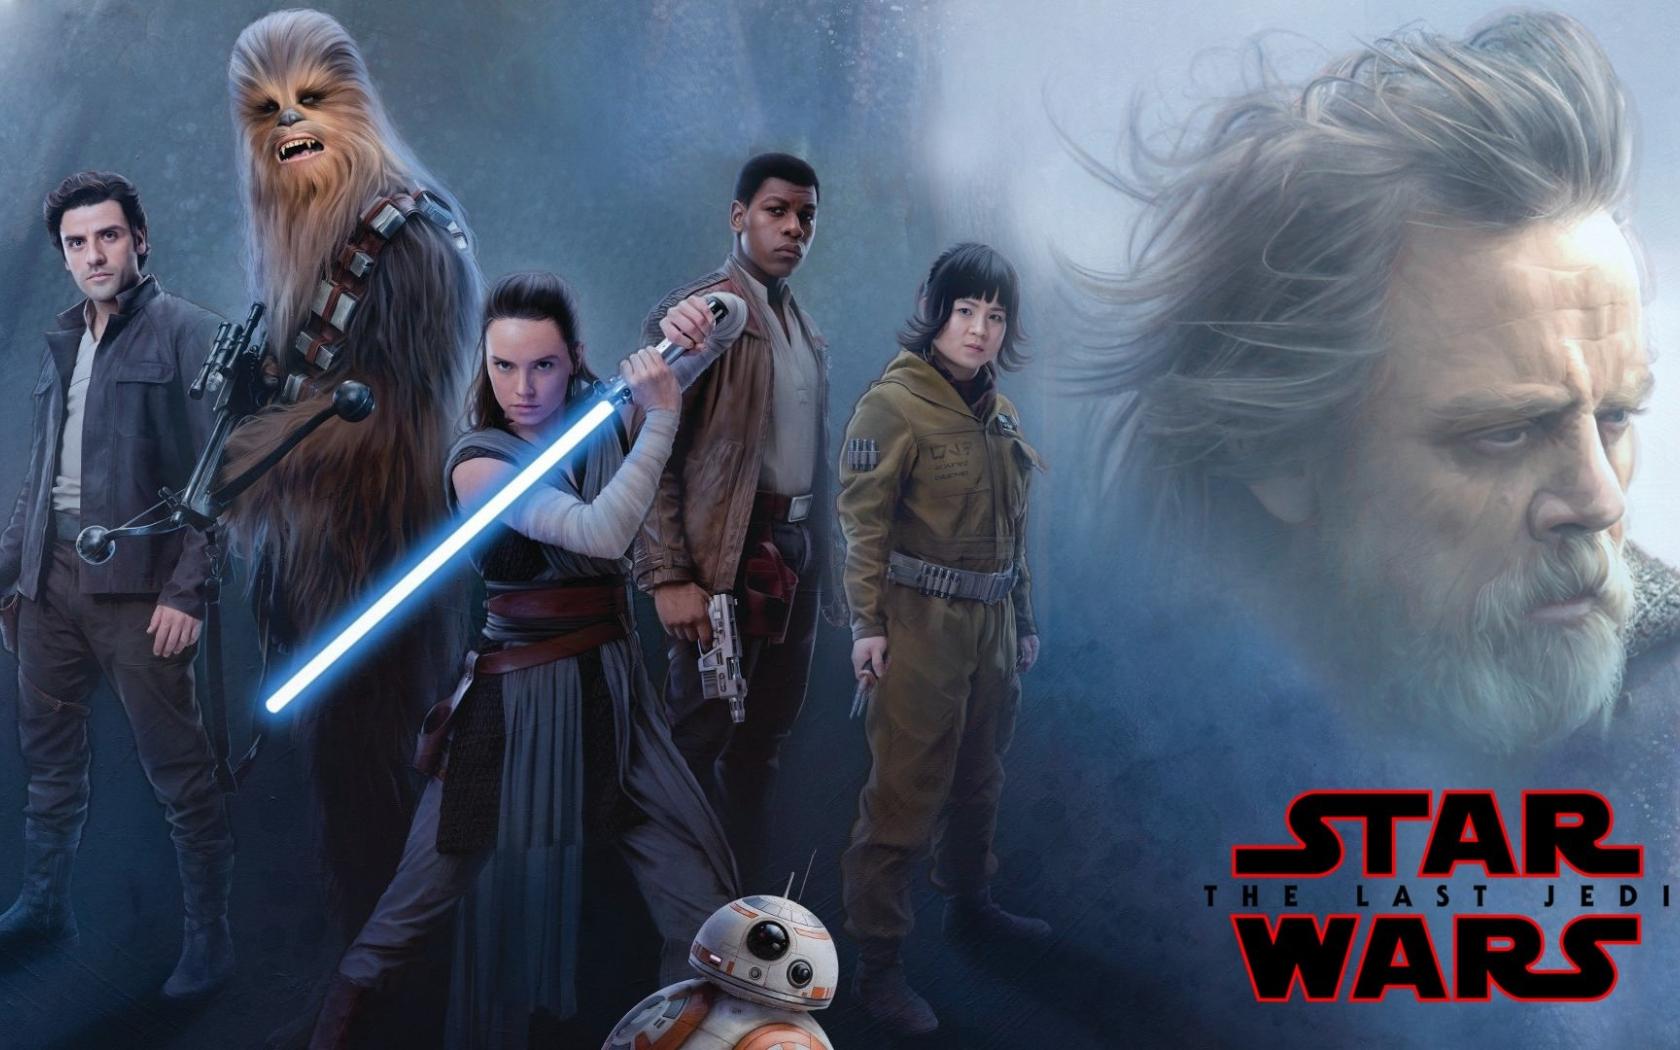 Daisy Ridley Star Wars Wallpaper: Star Wars Jedi Rey Daisy Ridley And Luke Skywalker, Full